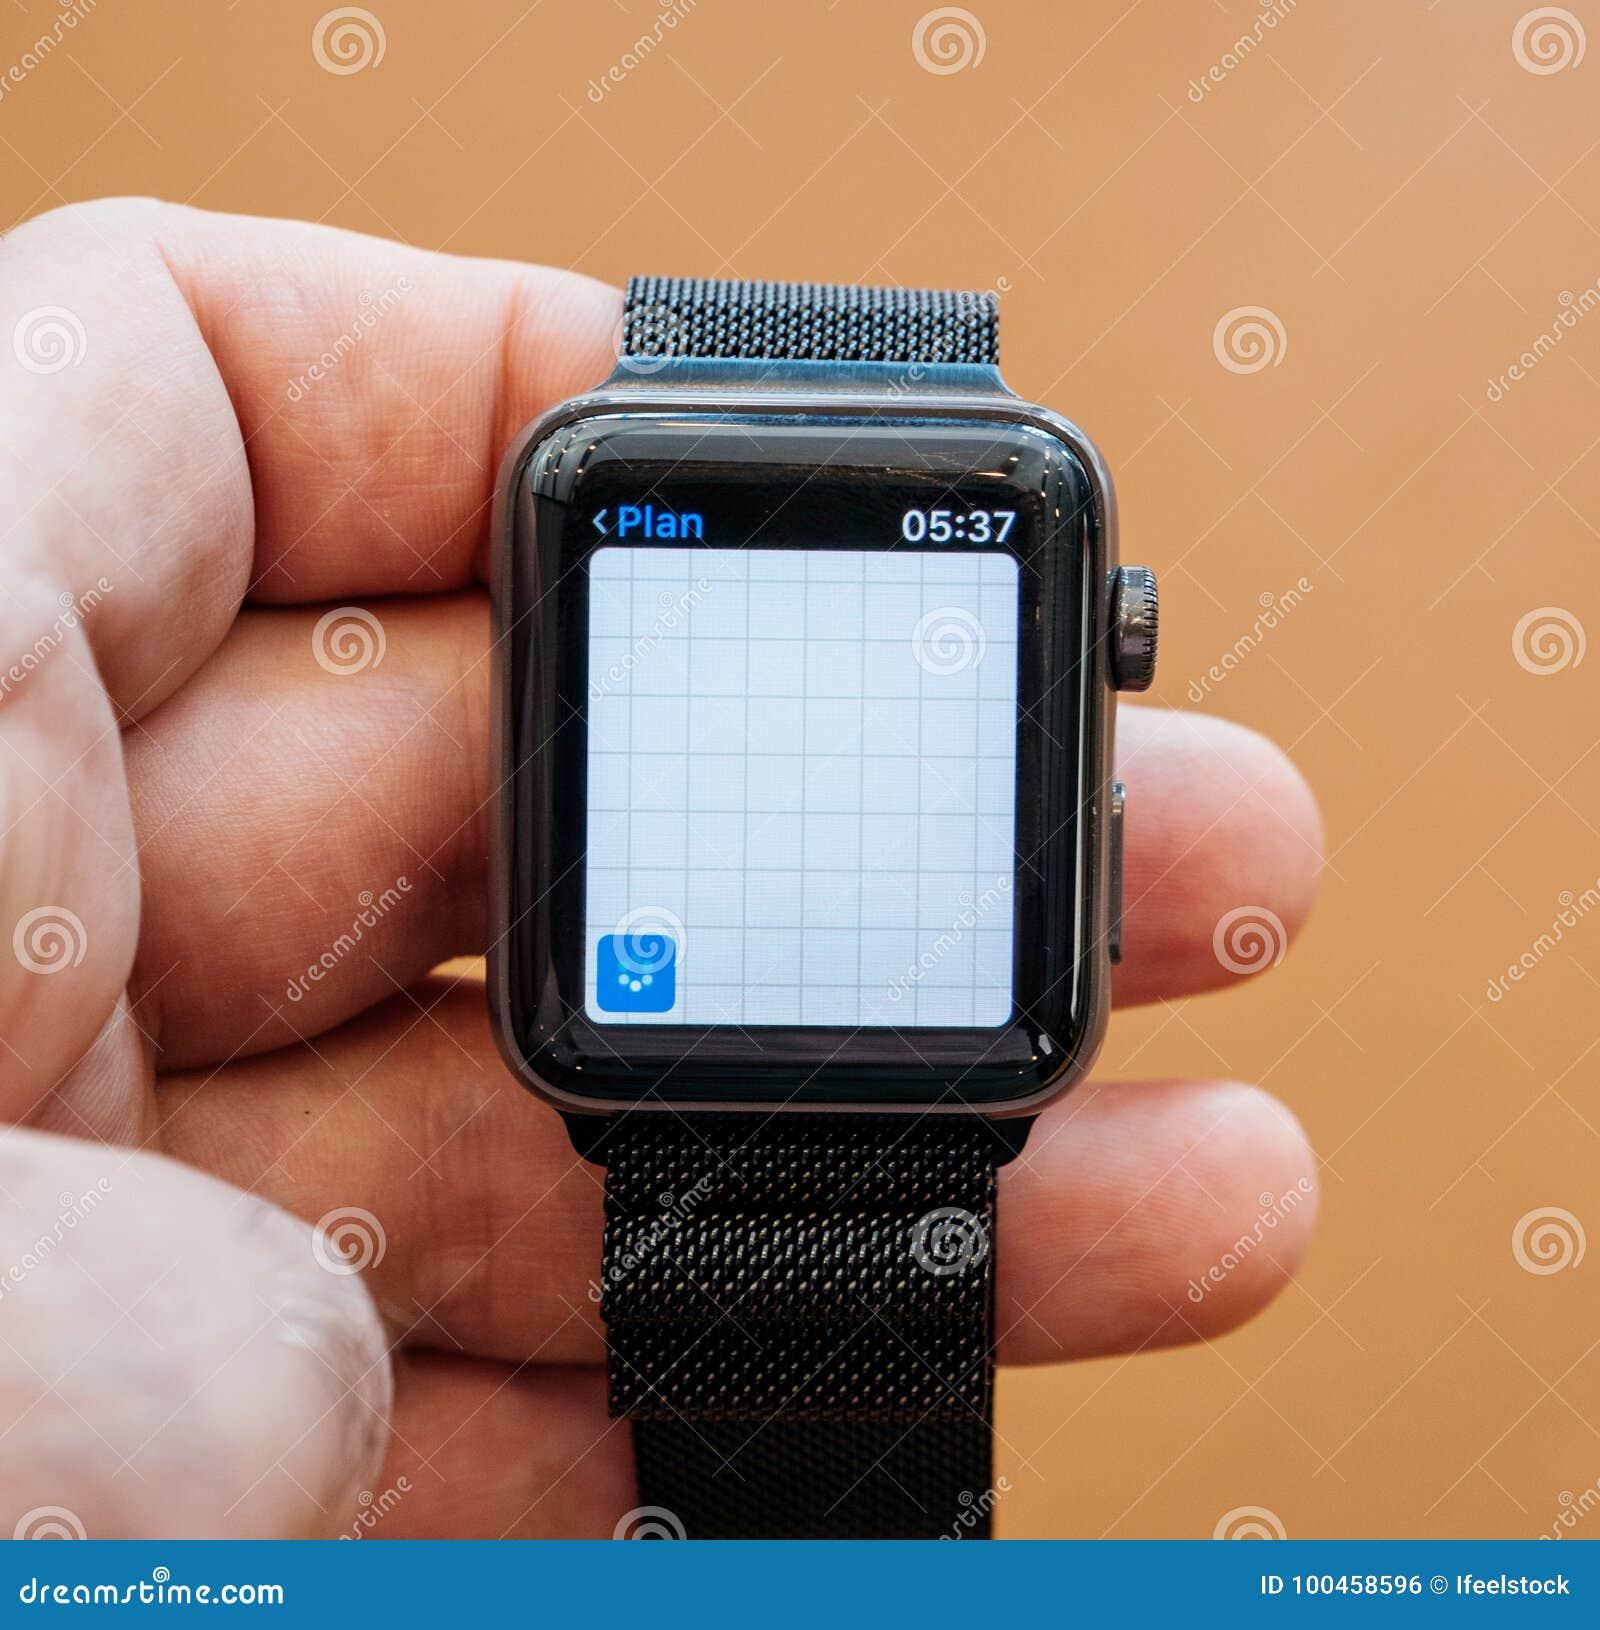 New Apple Watch Series 3 Apple Maps Location App Editorial Photo ... 4de911c51ee2